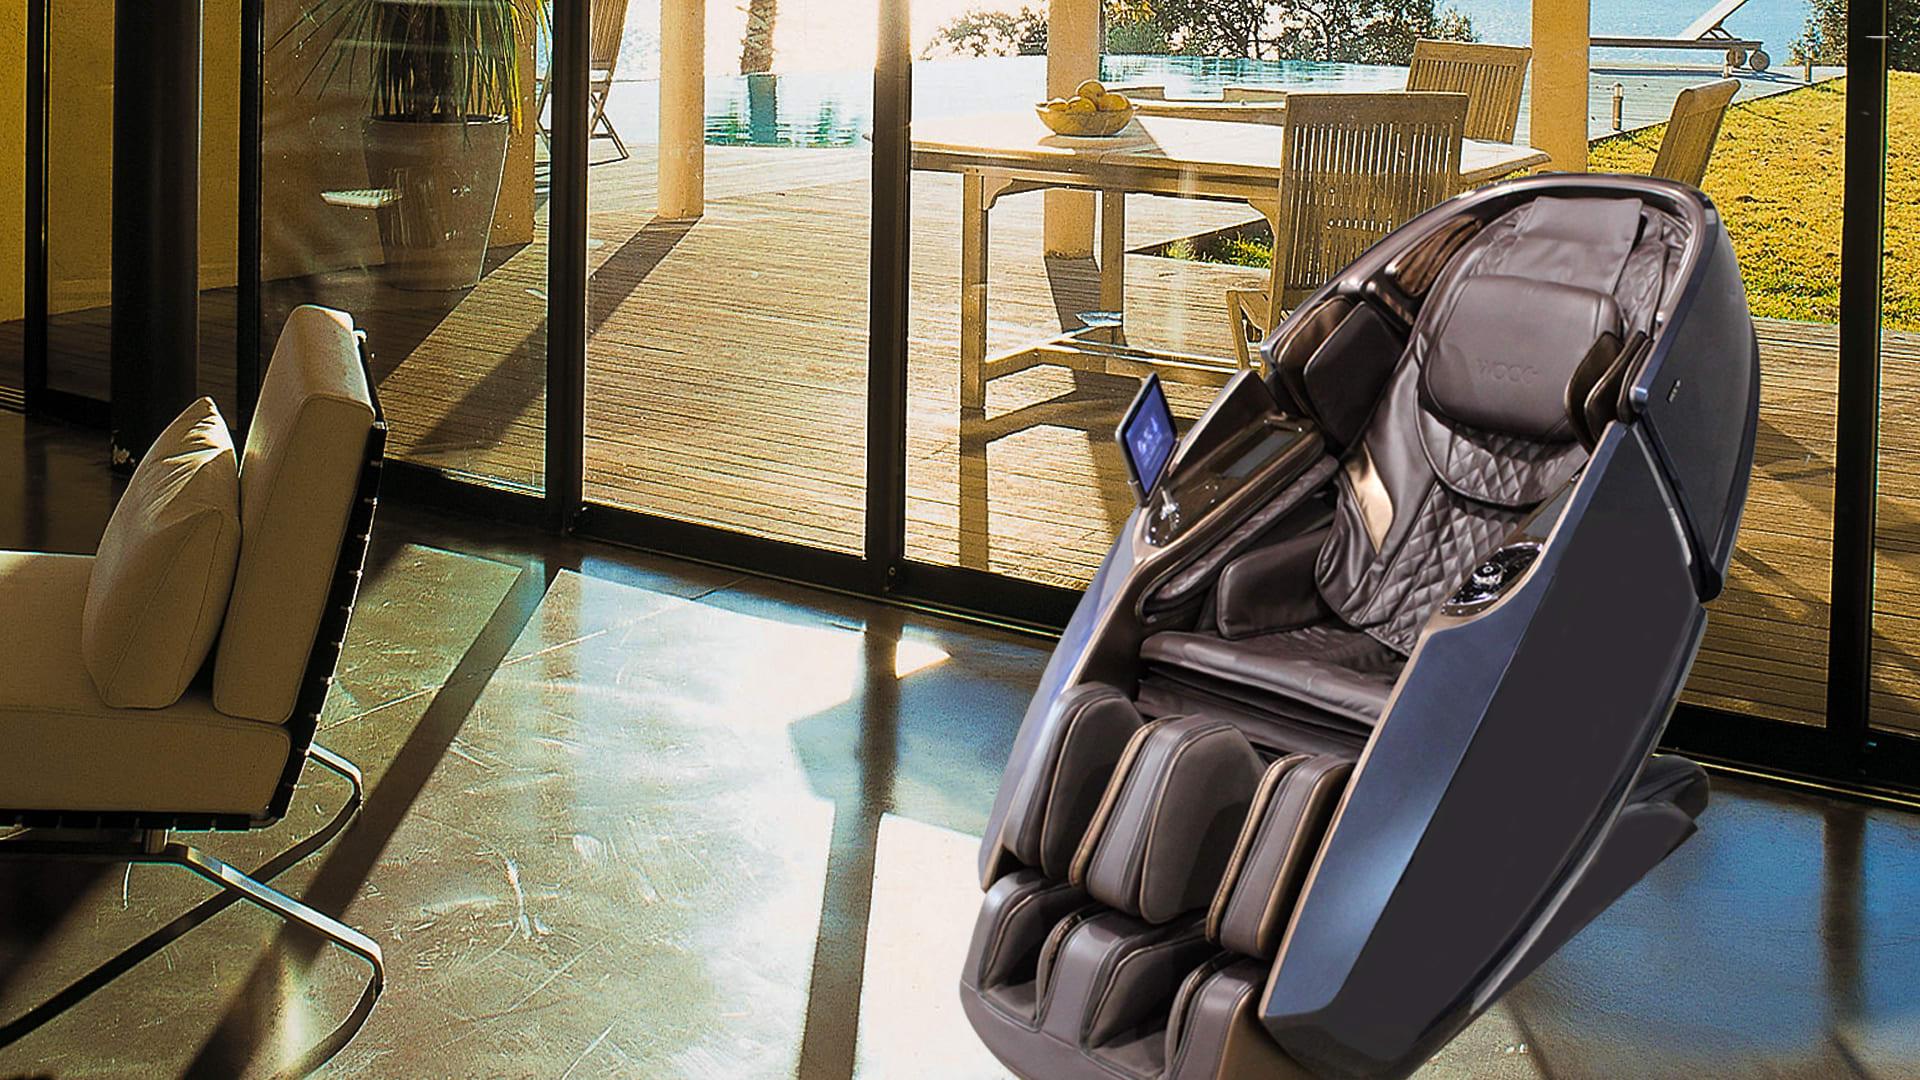 Galaxy X massagestol - stue eller kontor terasse område